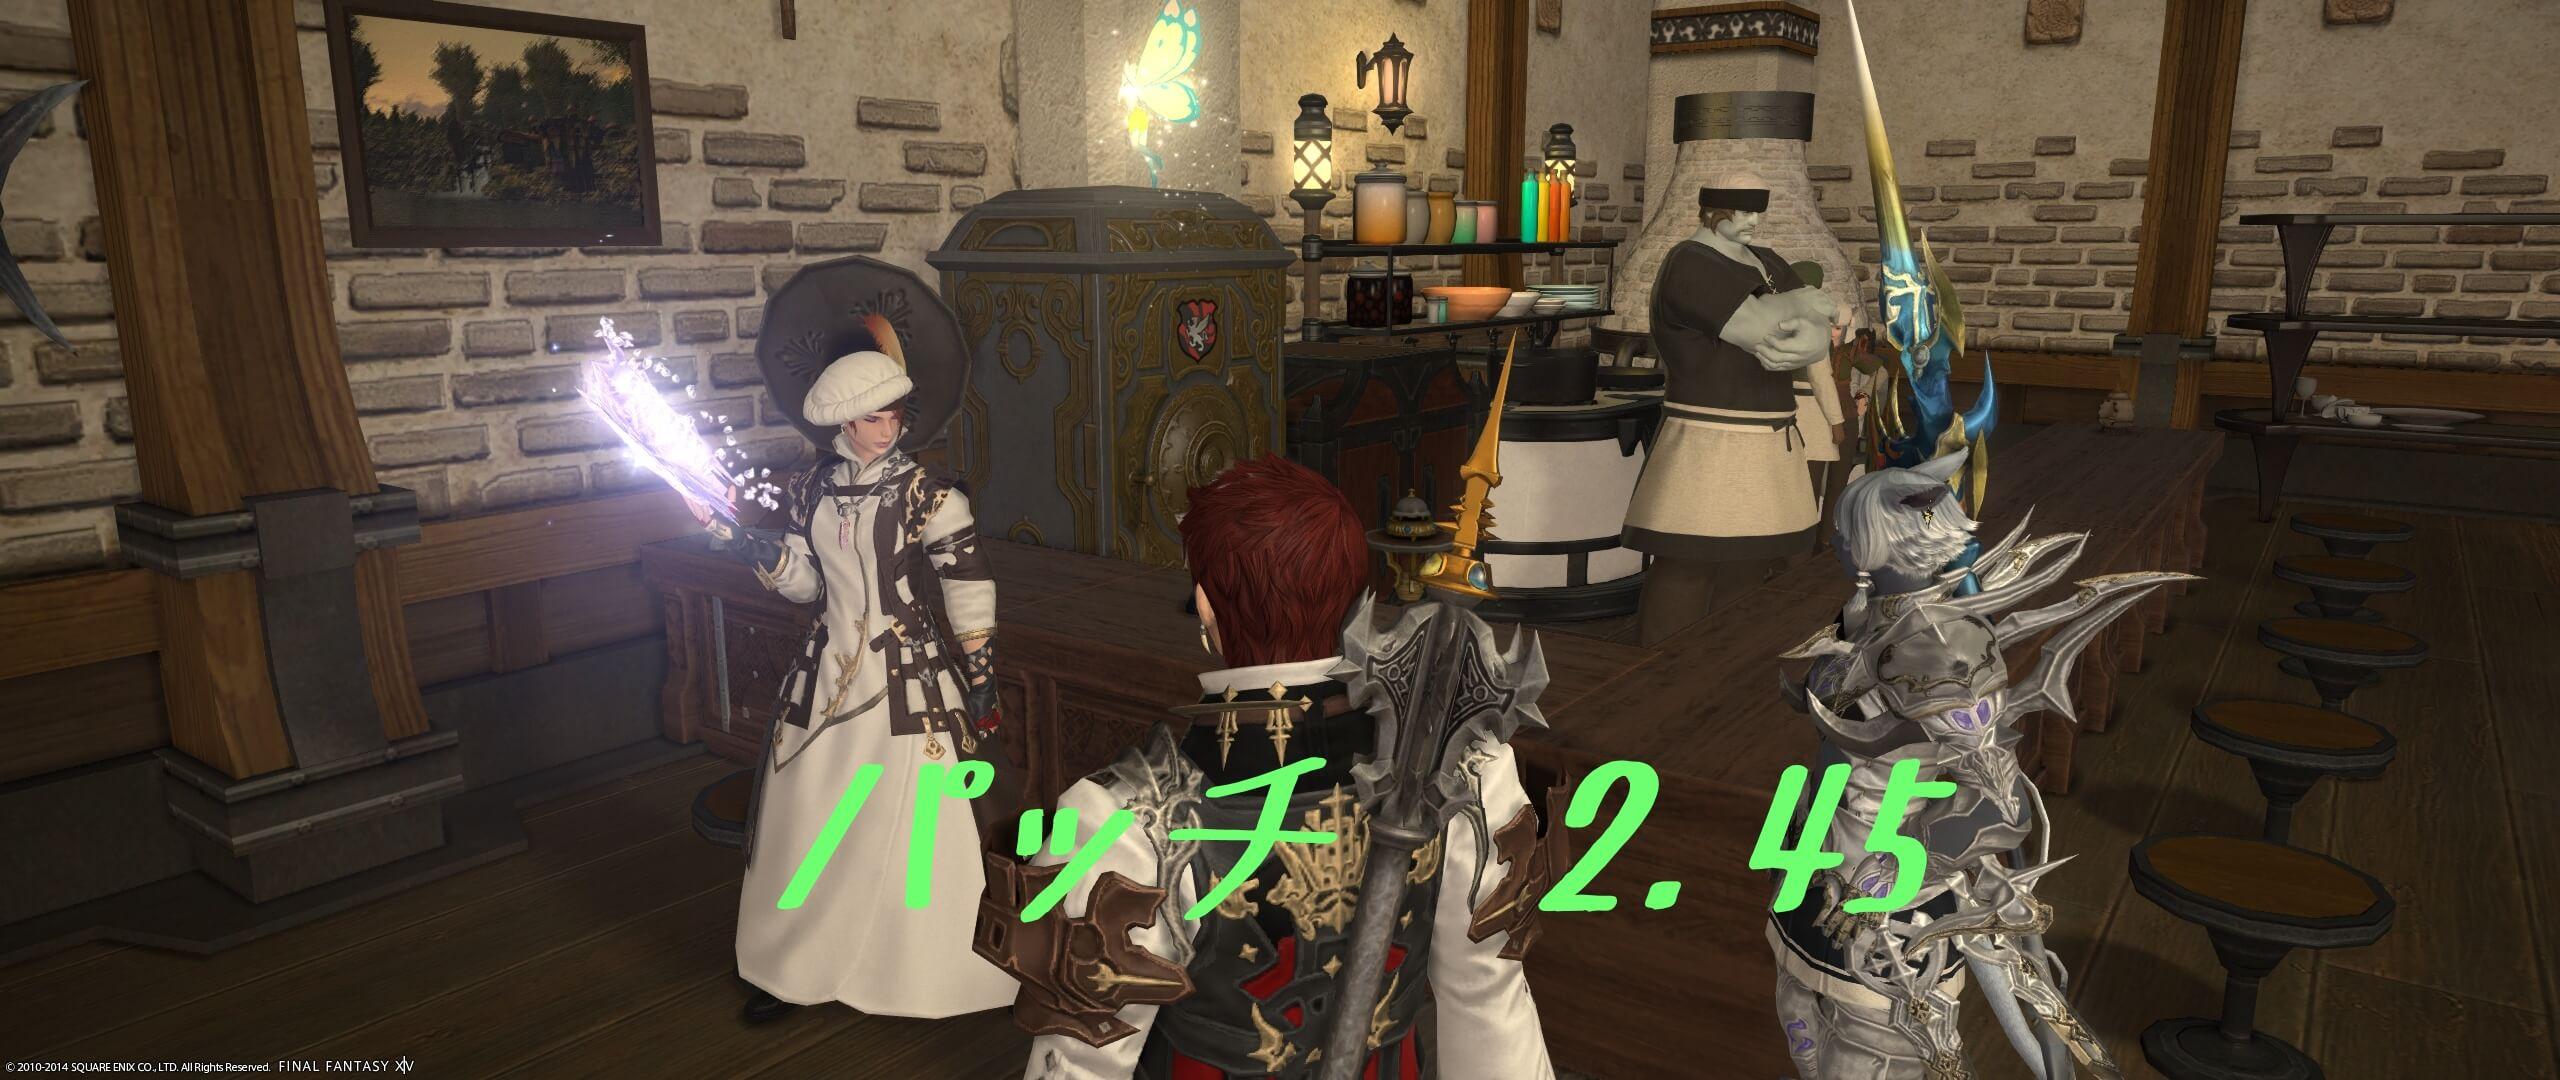 【FF14】パッチ2.45